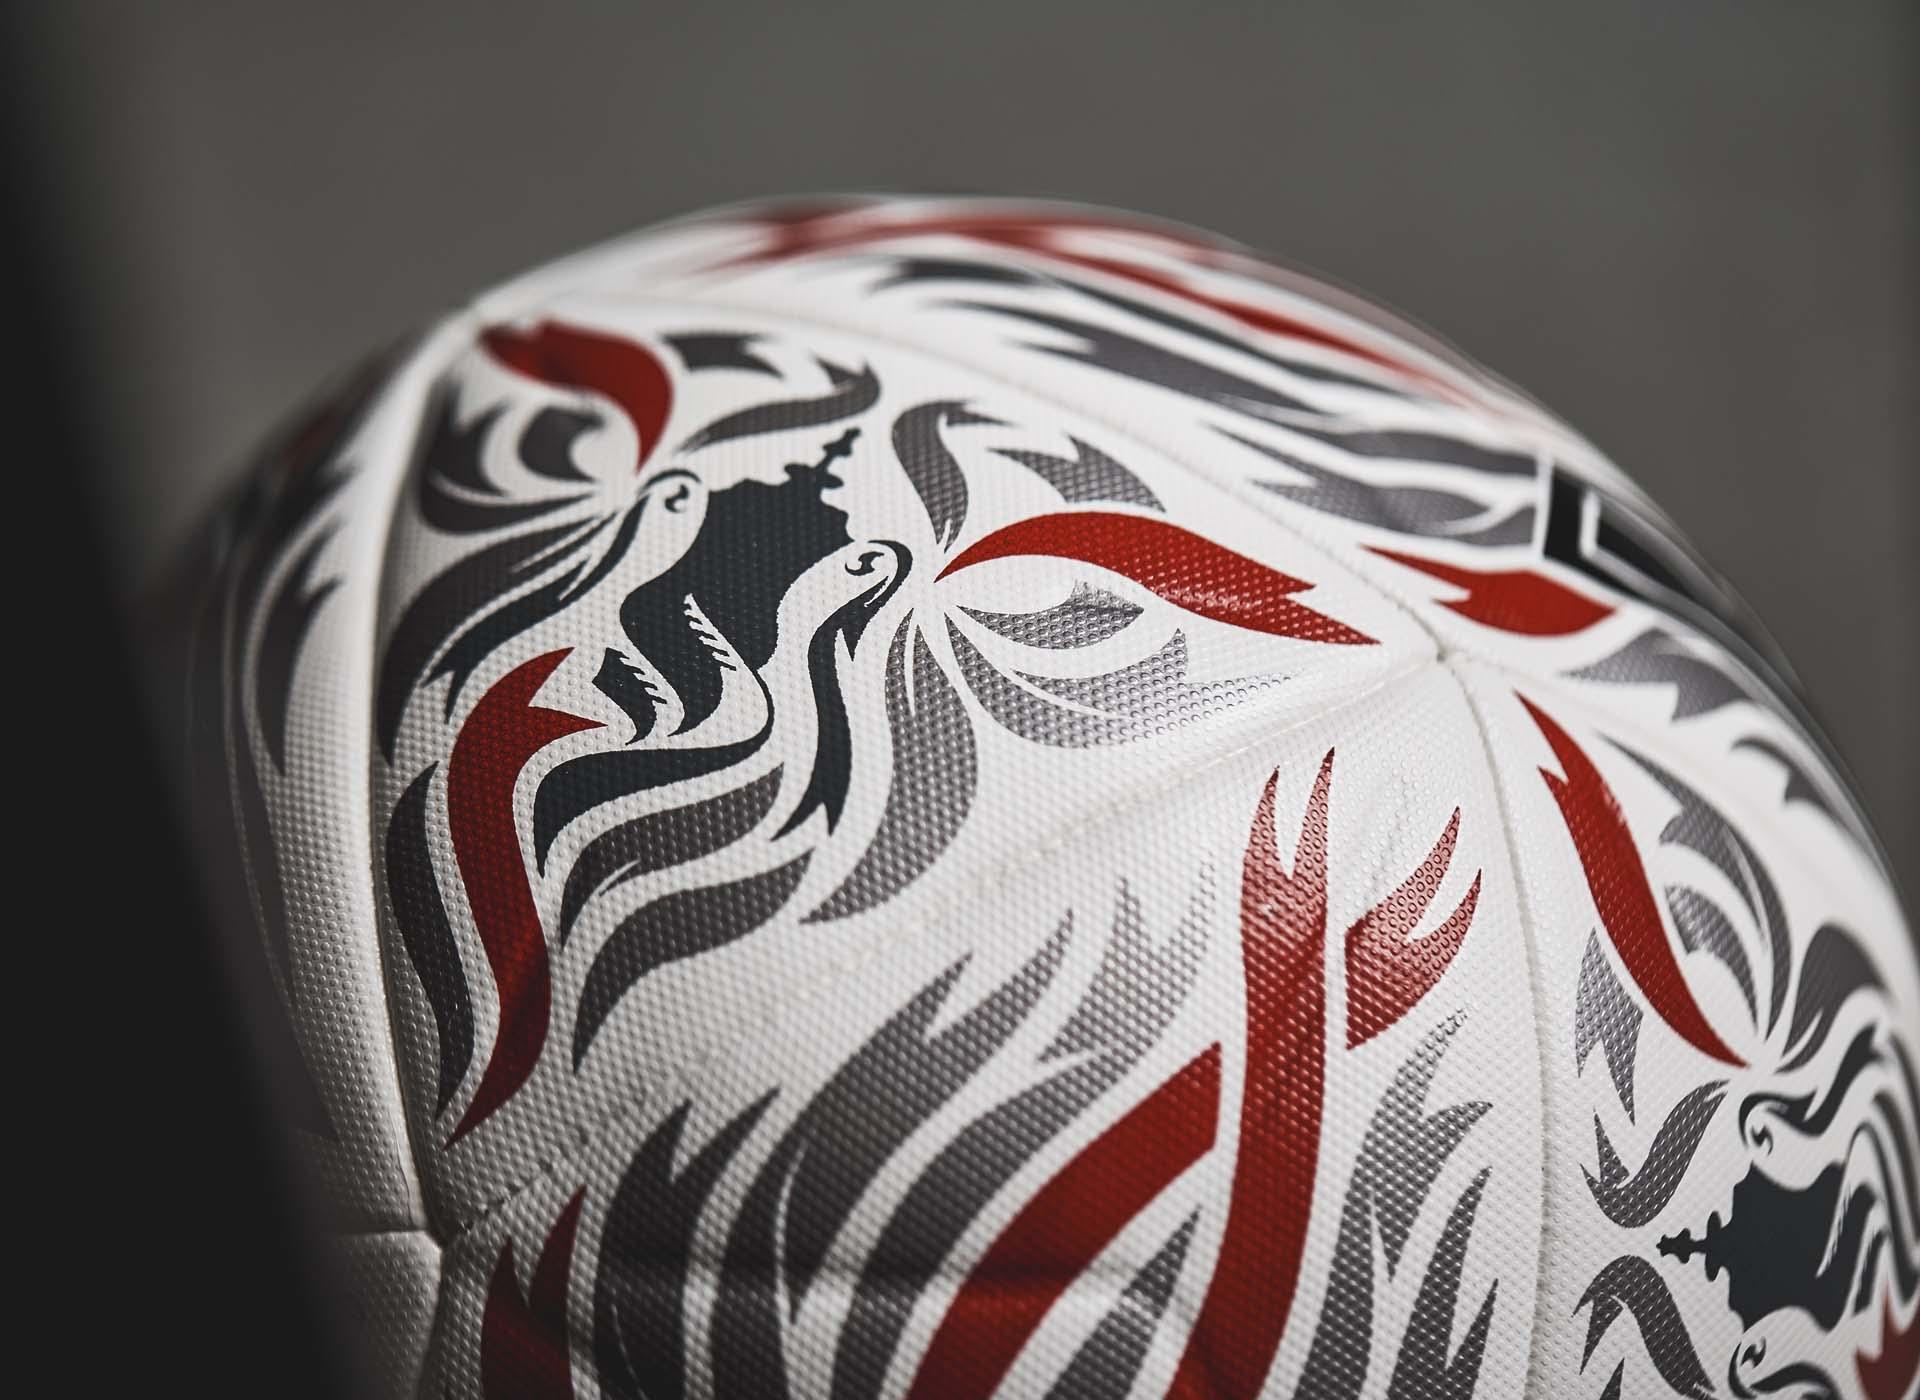 MitreFACup ball FI-min.jpg